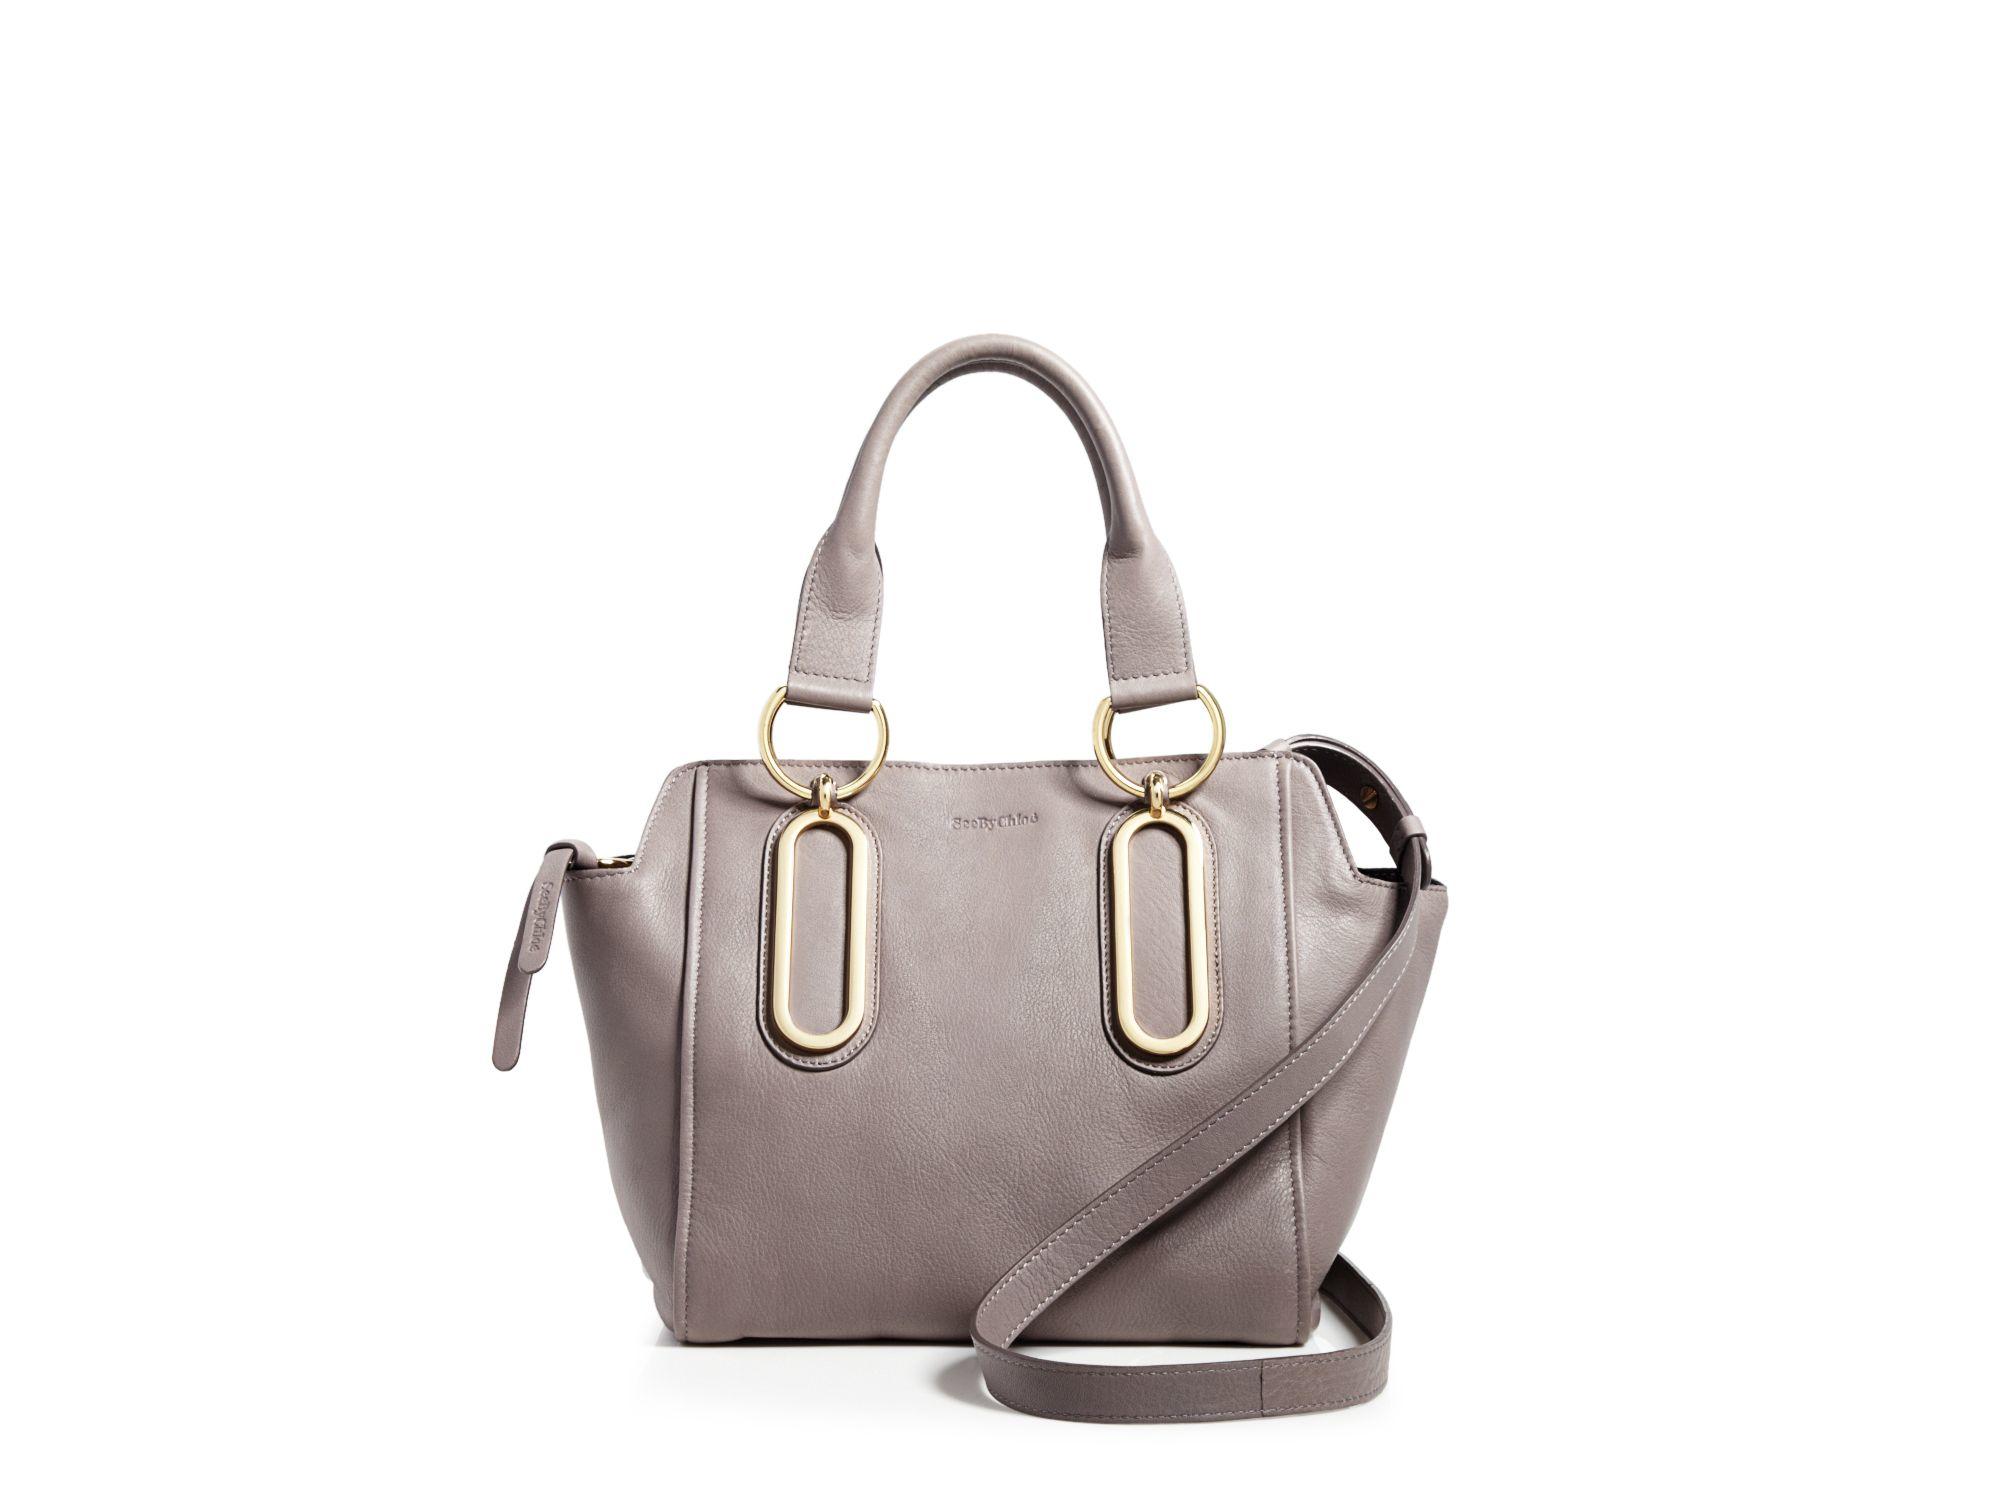 9308b6f2d9ee Bloomingdales bags - New Store Deals